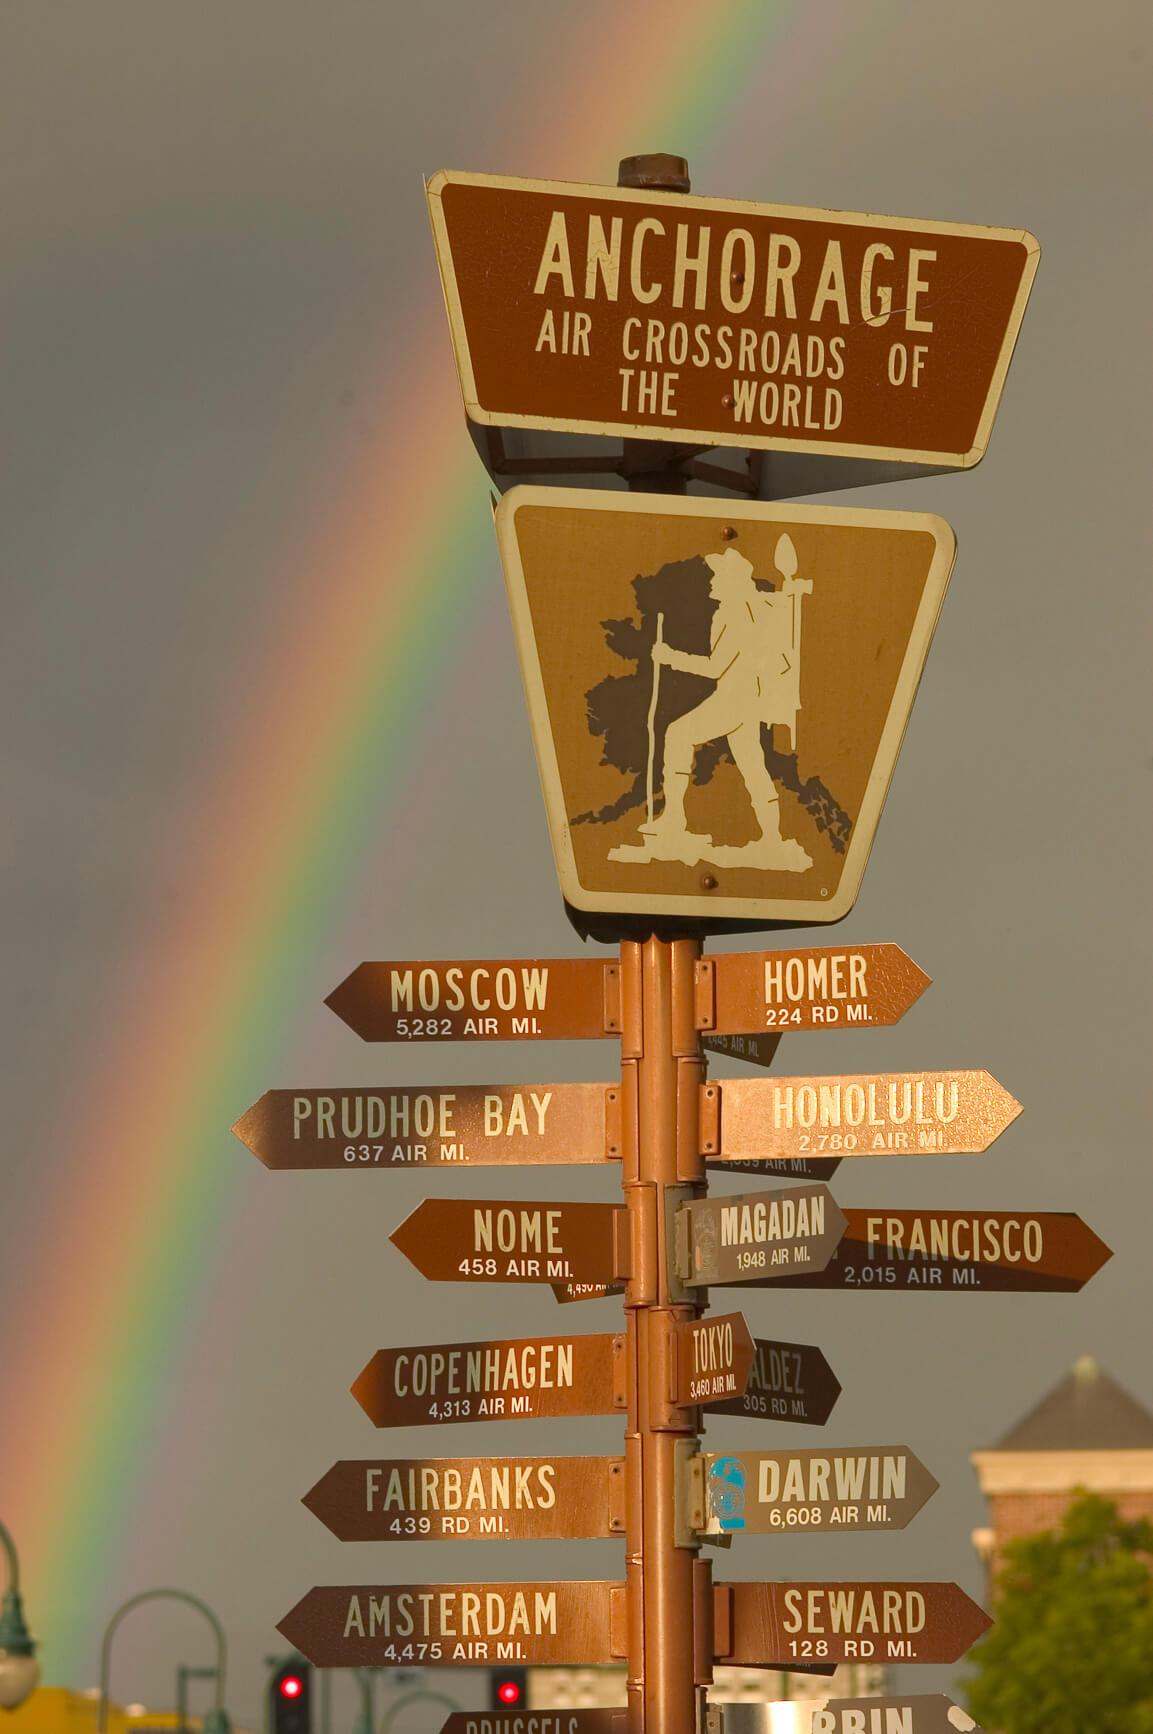 https://bubo.sk/uploads/galleries/7325/aljaska_matthage_anchorage_396.jpg-5.jpg